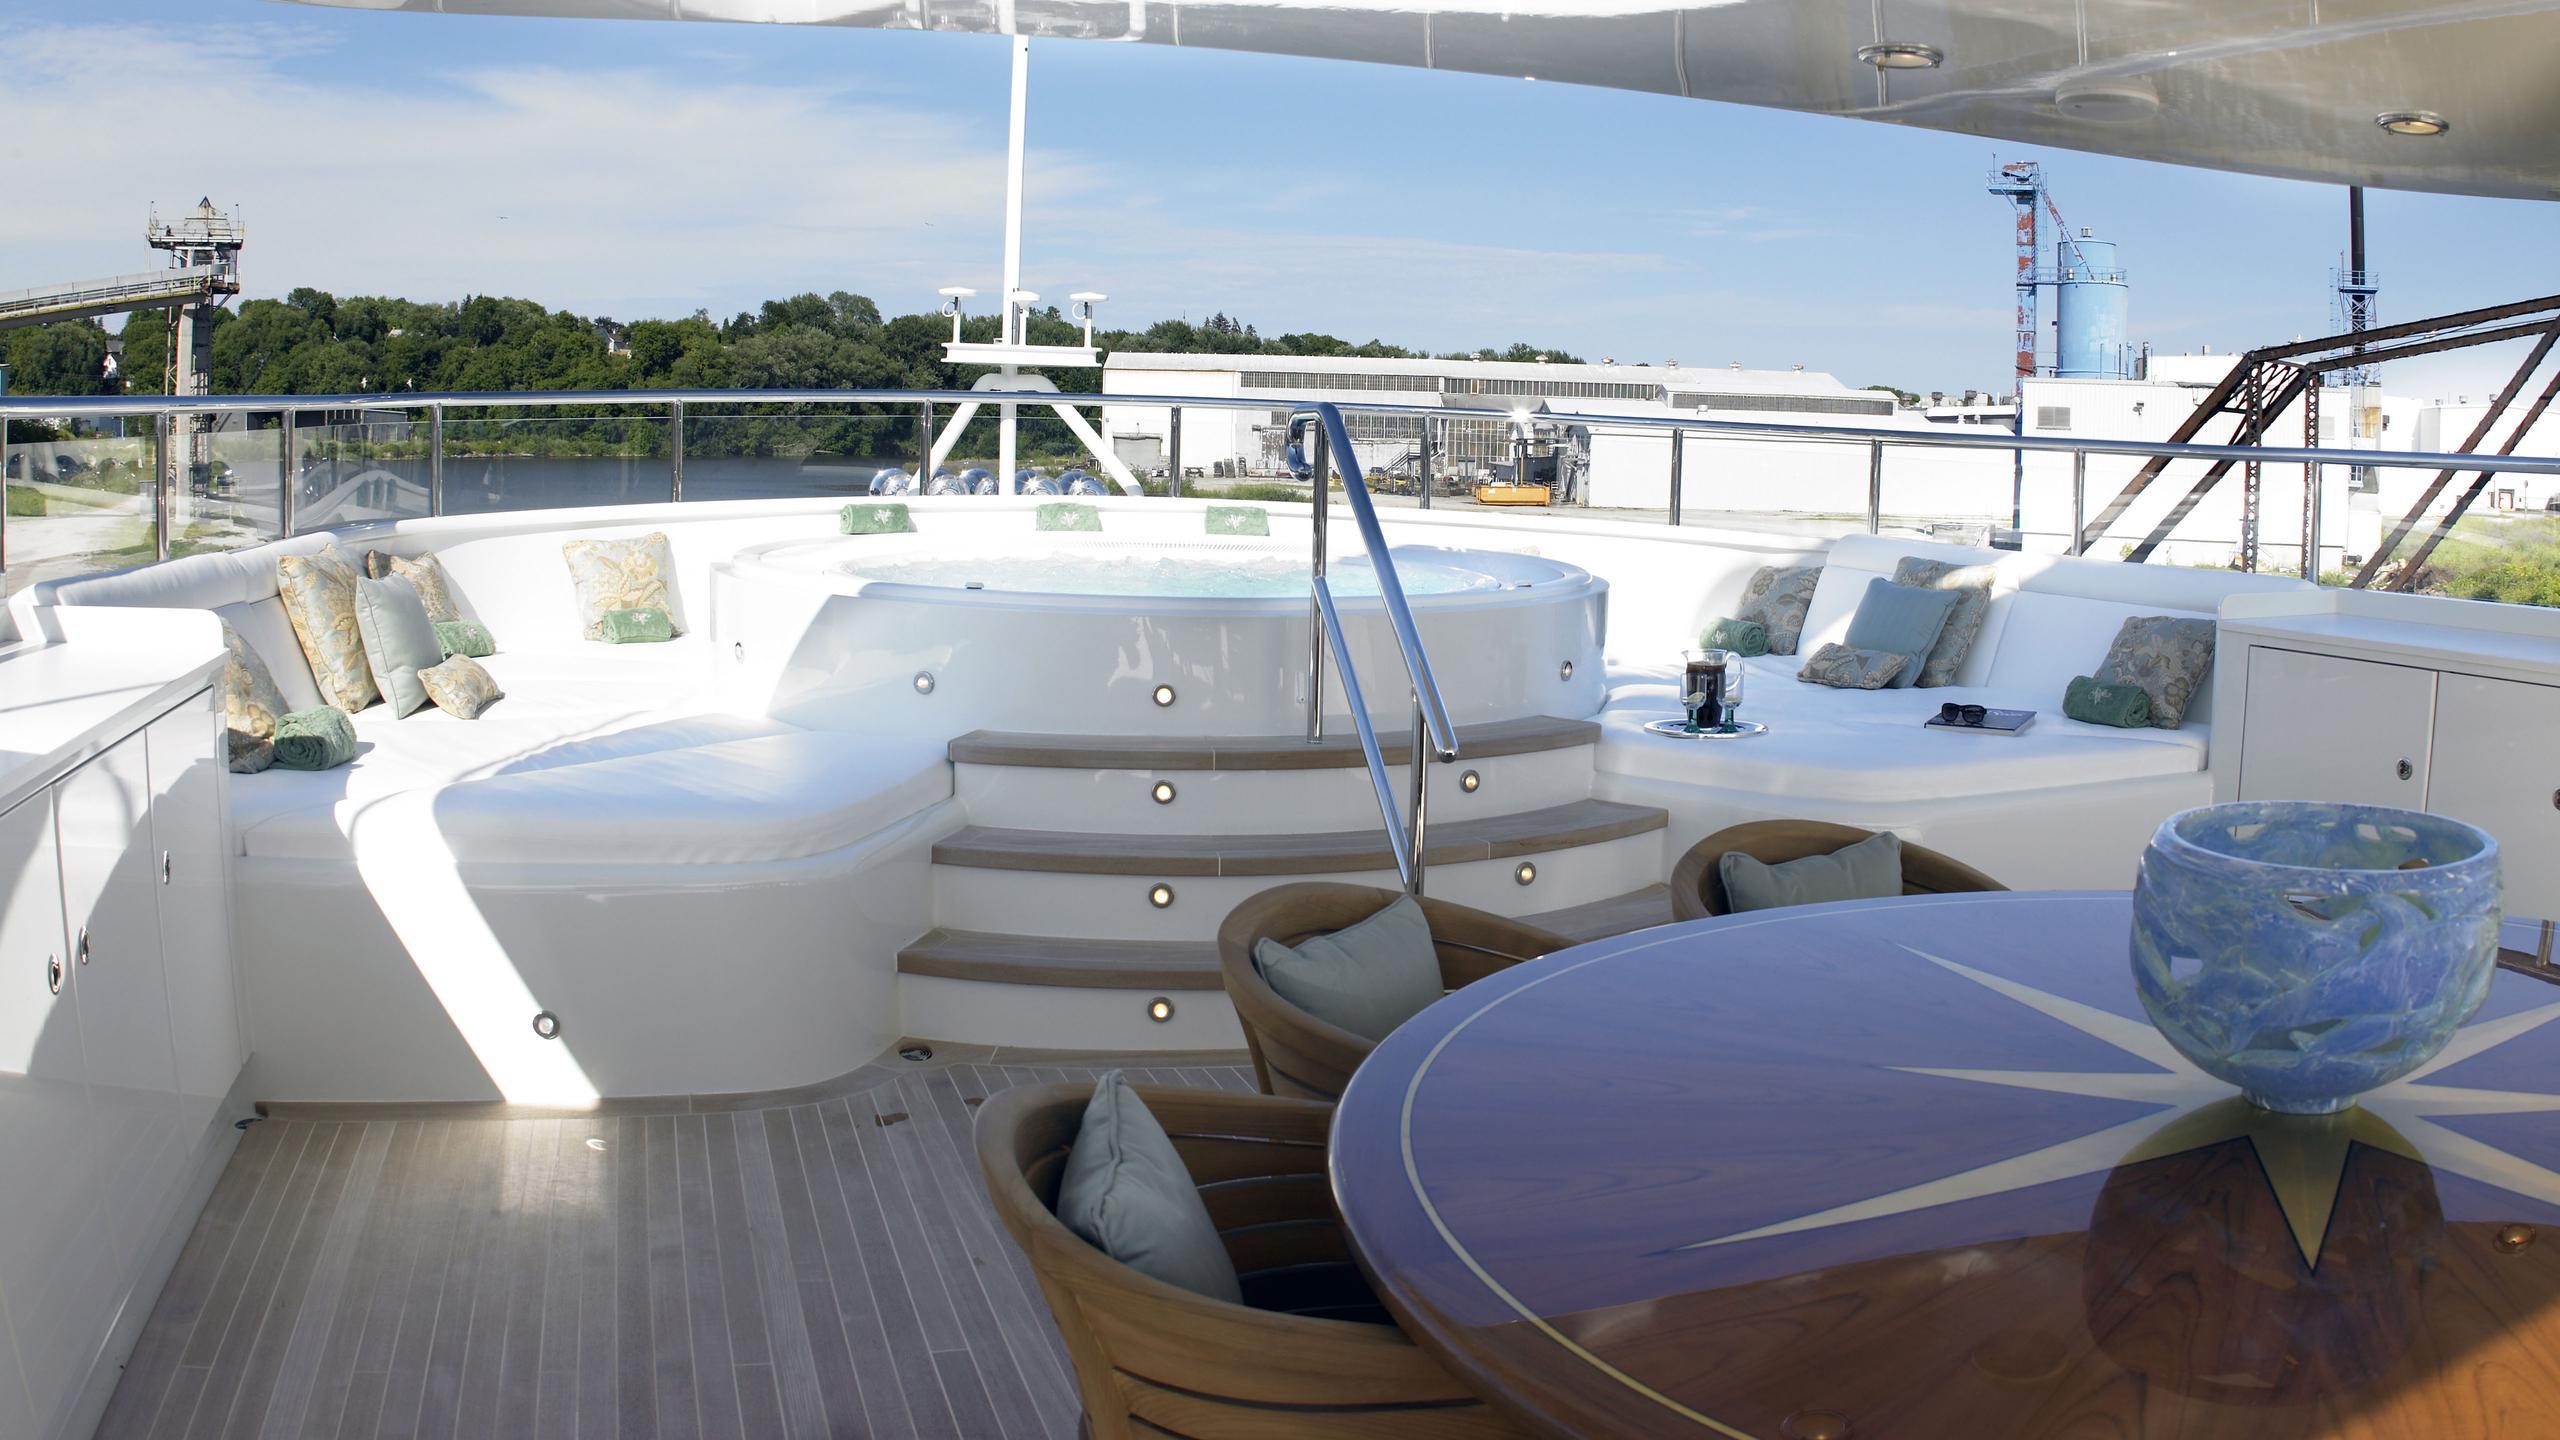 maghreb-v-yacht-hot-tub